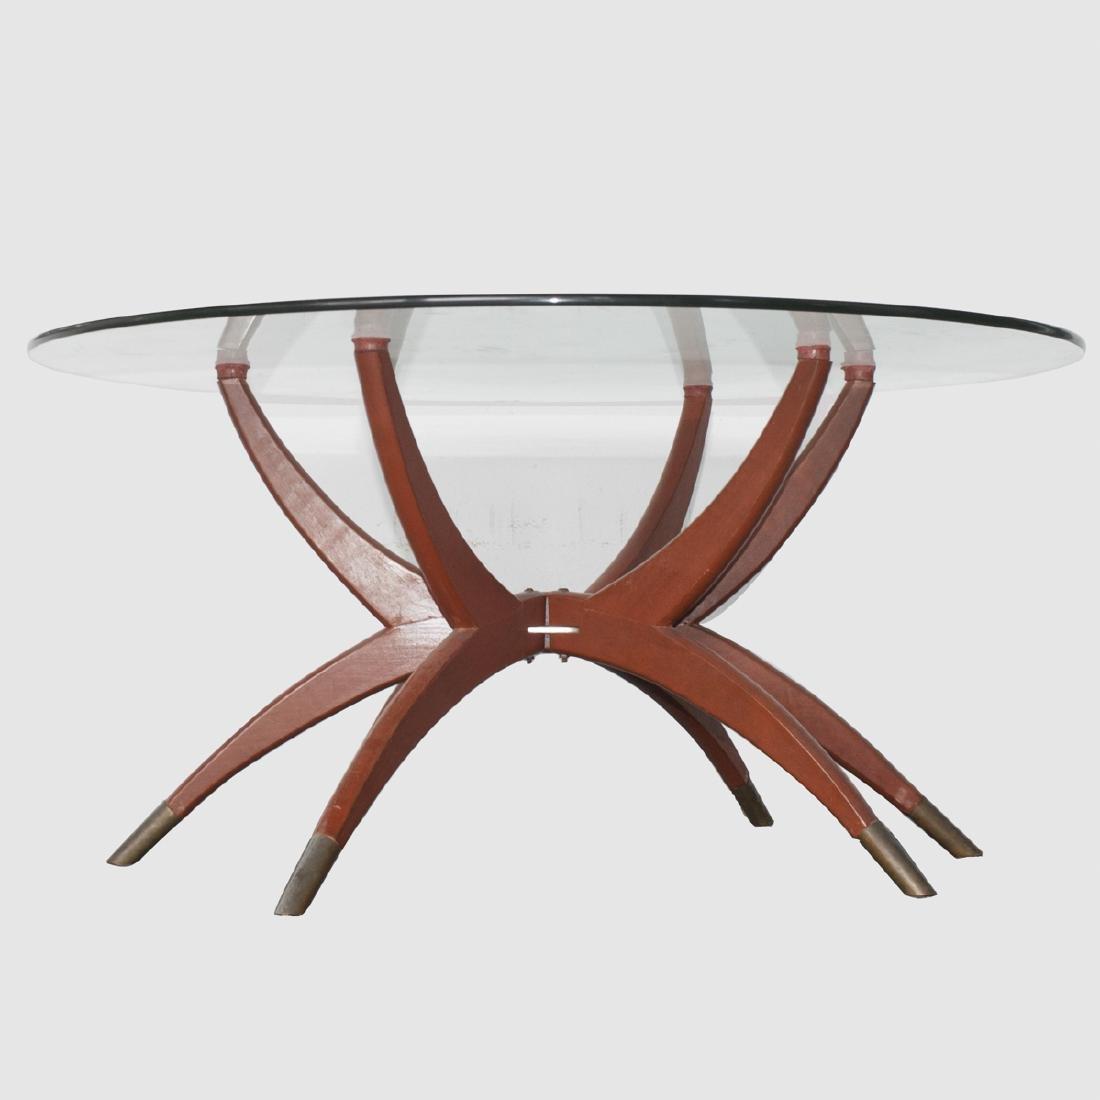 Danish Mid-Century Style Coffee Table